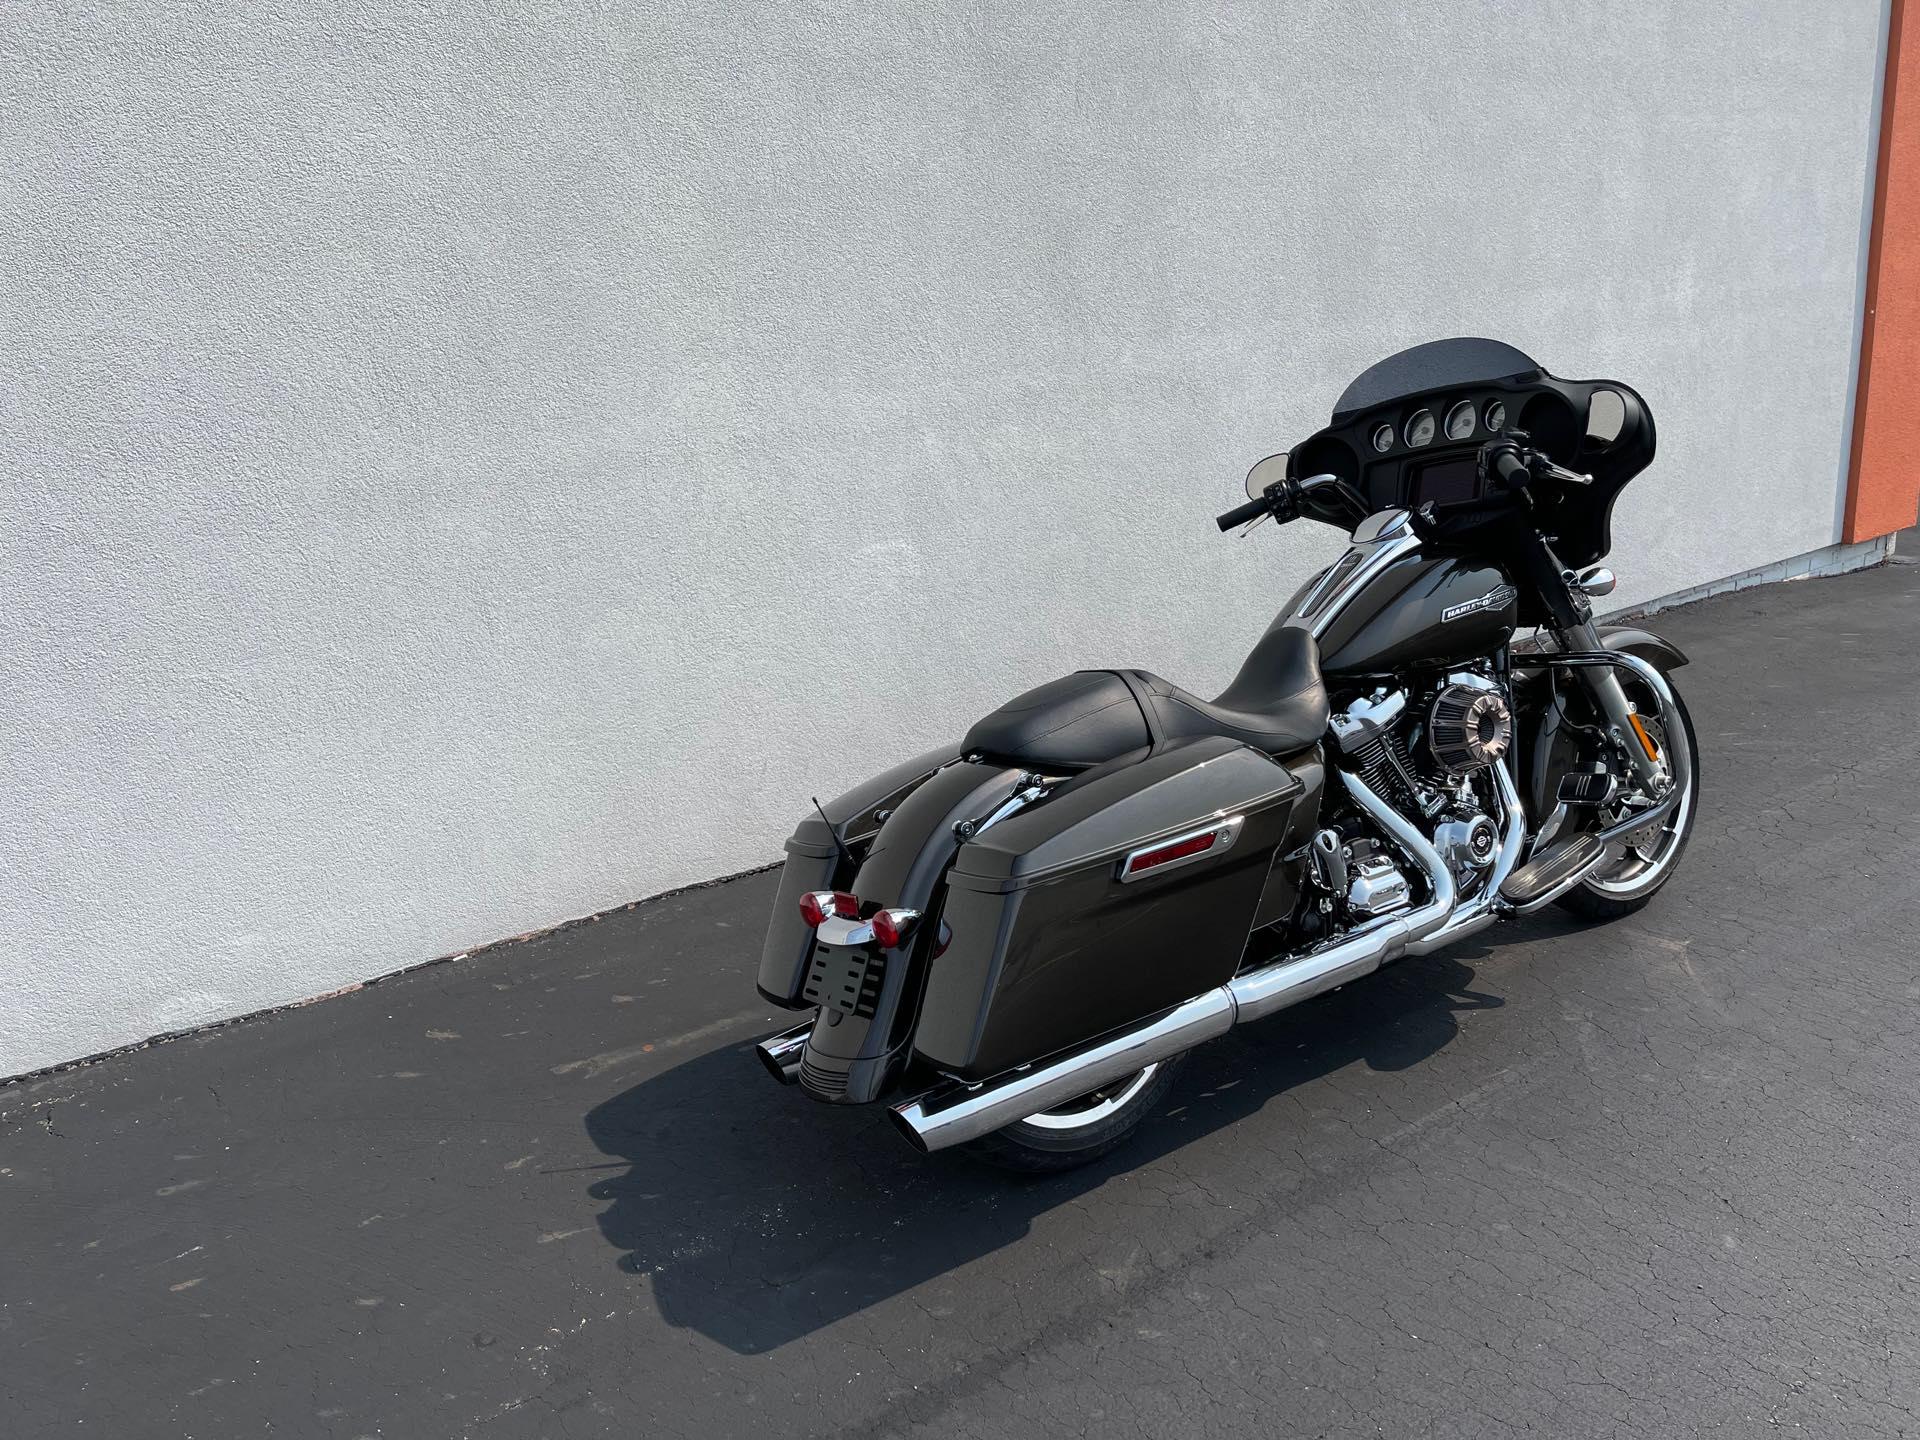 2021 Harley-Davidson Grand American Touring Street Glide at Thunder Harley-Davidson